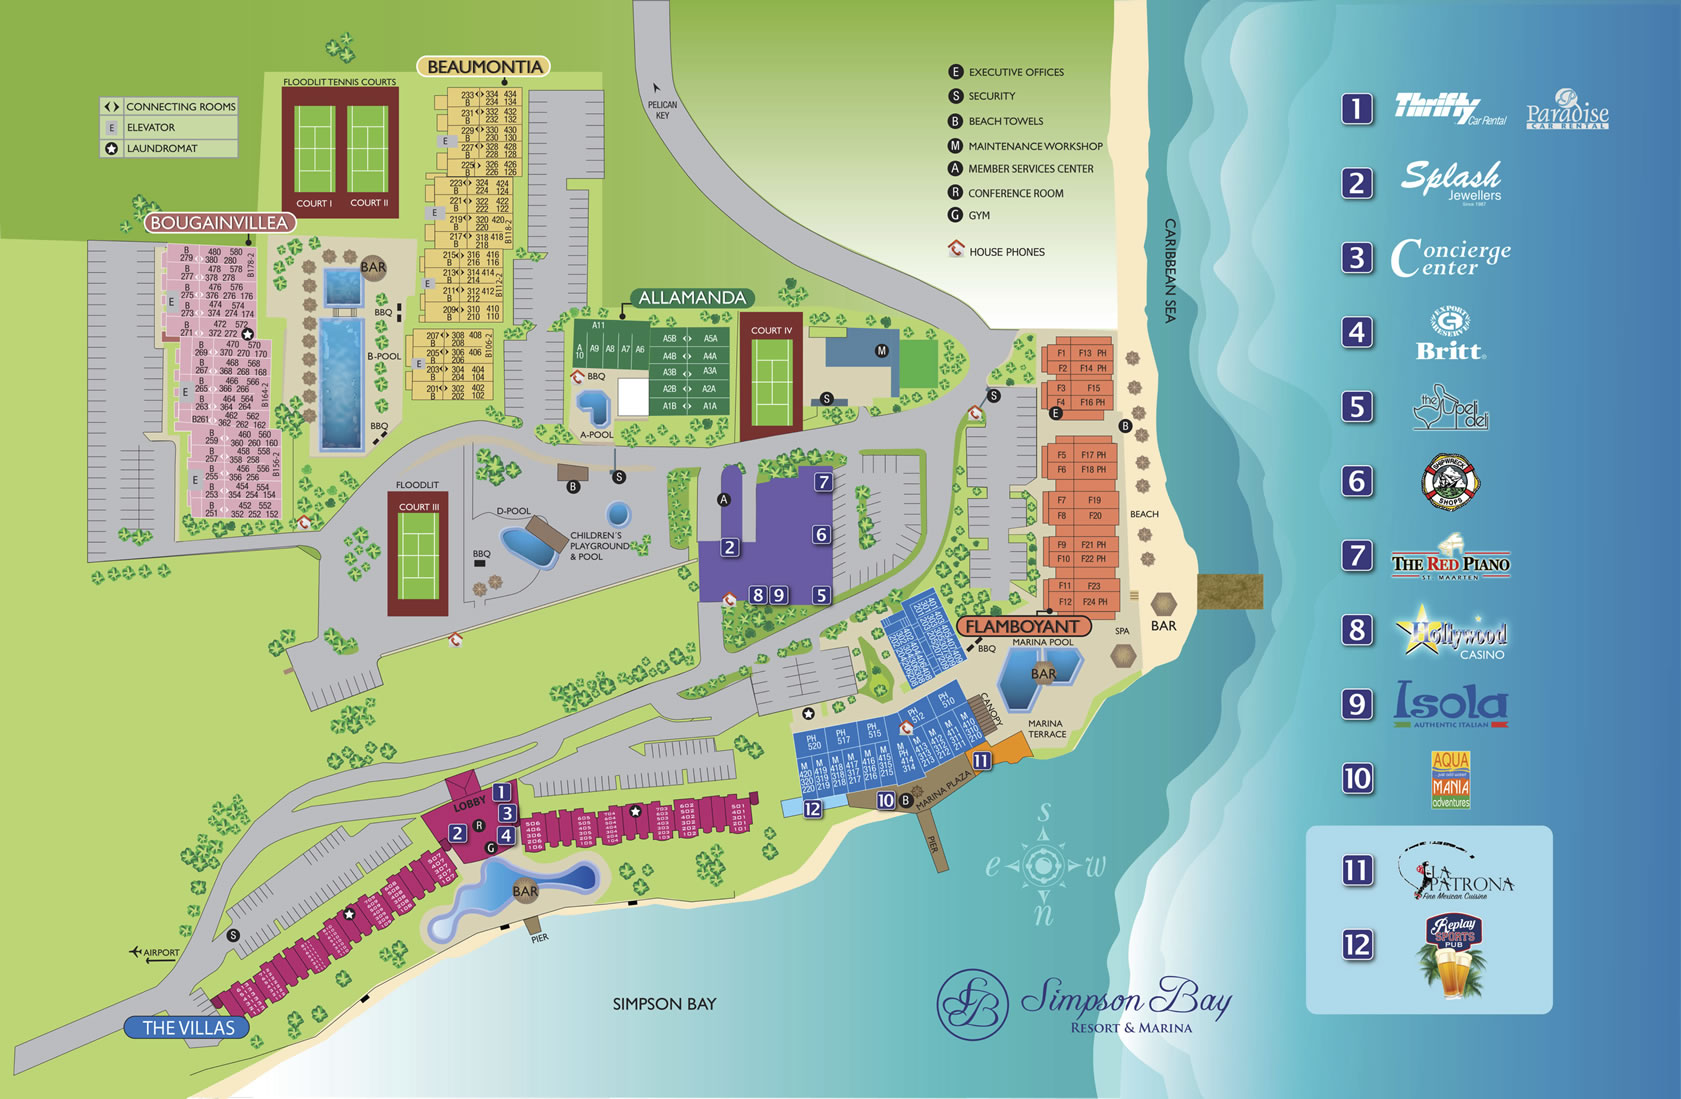 St Maarten Resort | Simpson Bay Beach Resort and Marina